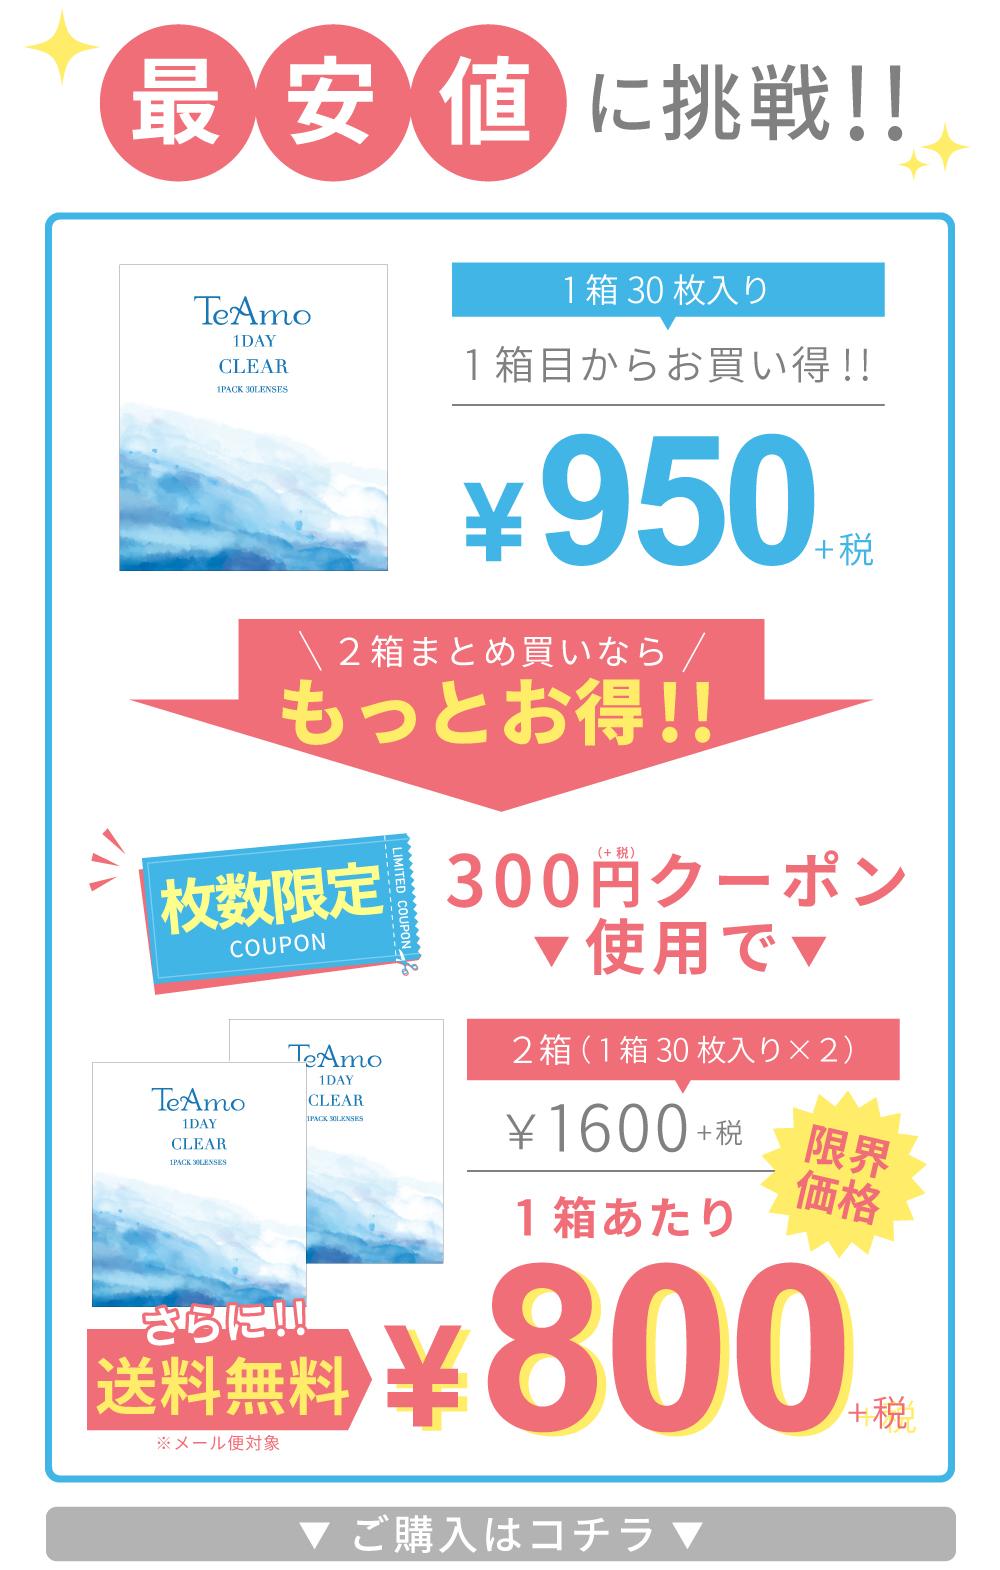 「TeAmo 1DAY CLEAR(ティアモワンデークリア)」価格